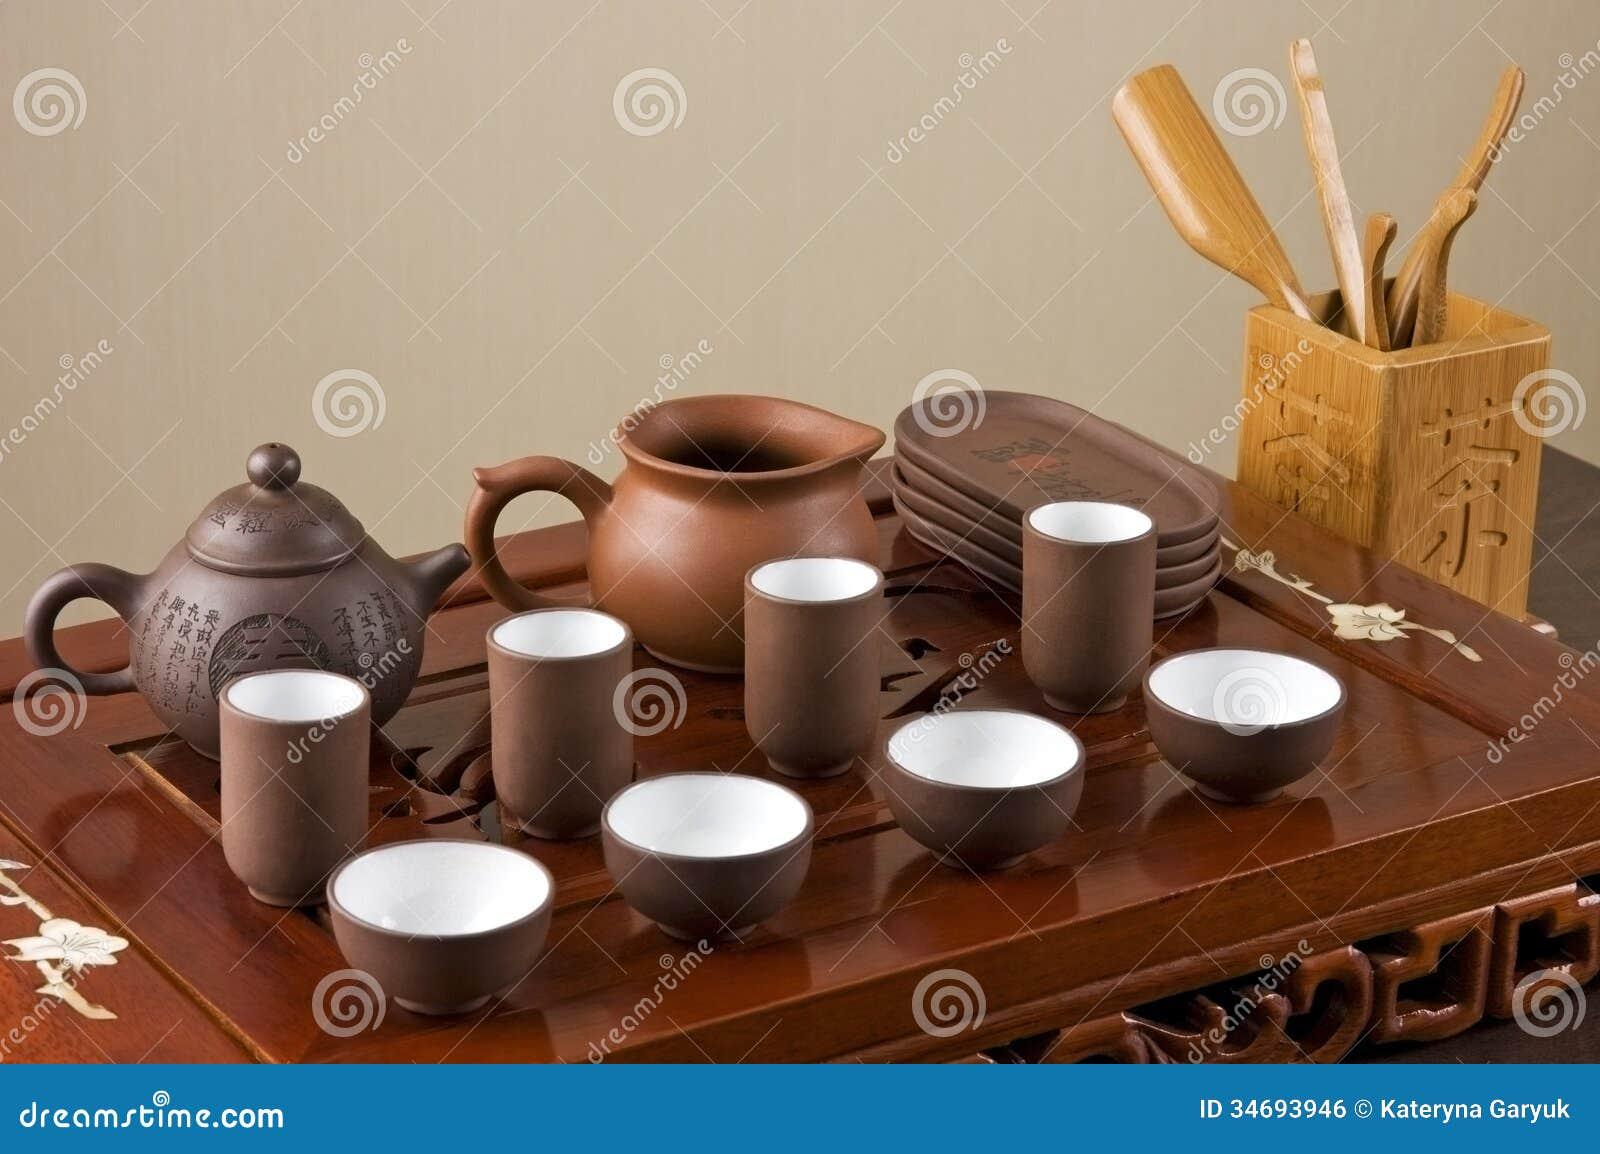 Tea Ceremony Royalty Free Stock Image Image 34693946